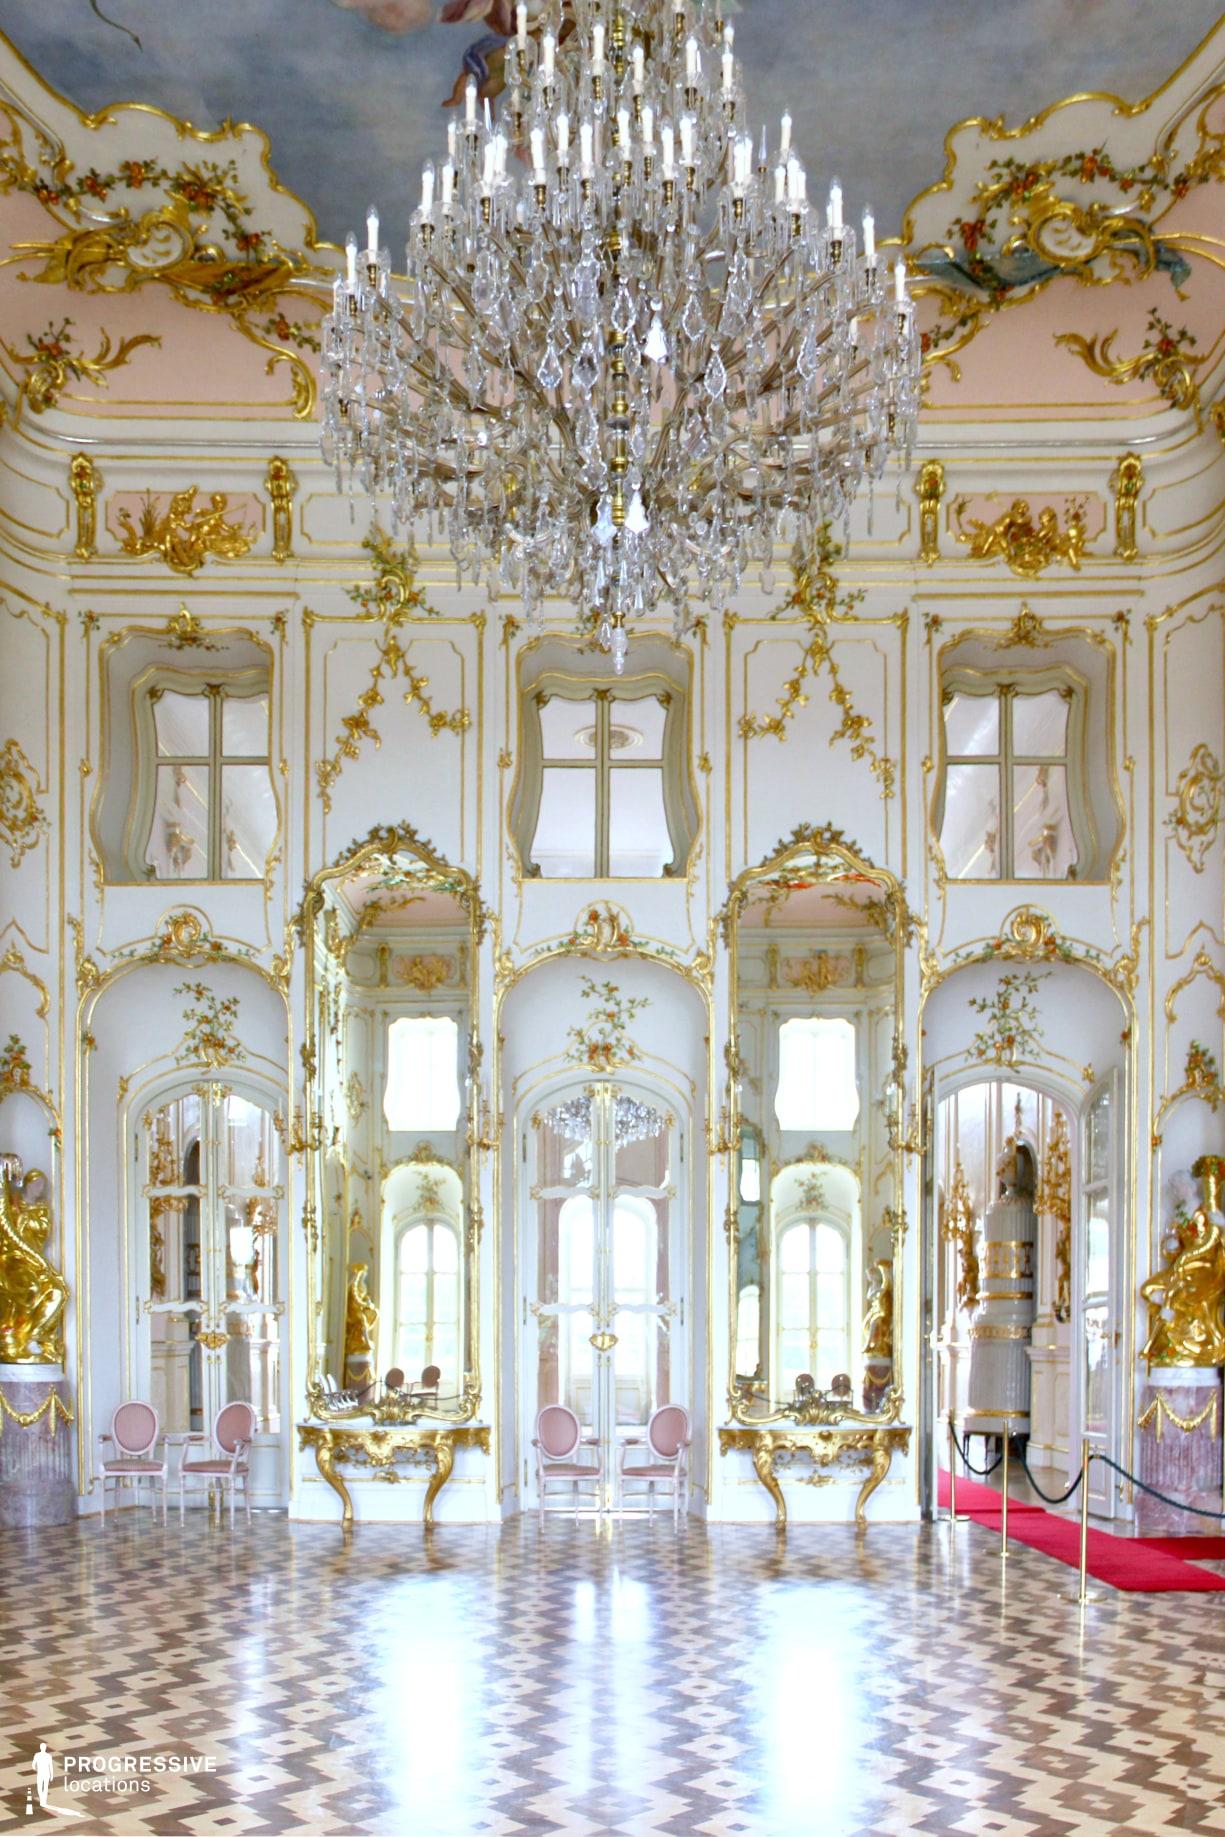 Locations in Hungary: Ballroom, Esterhazy Palace